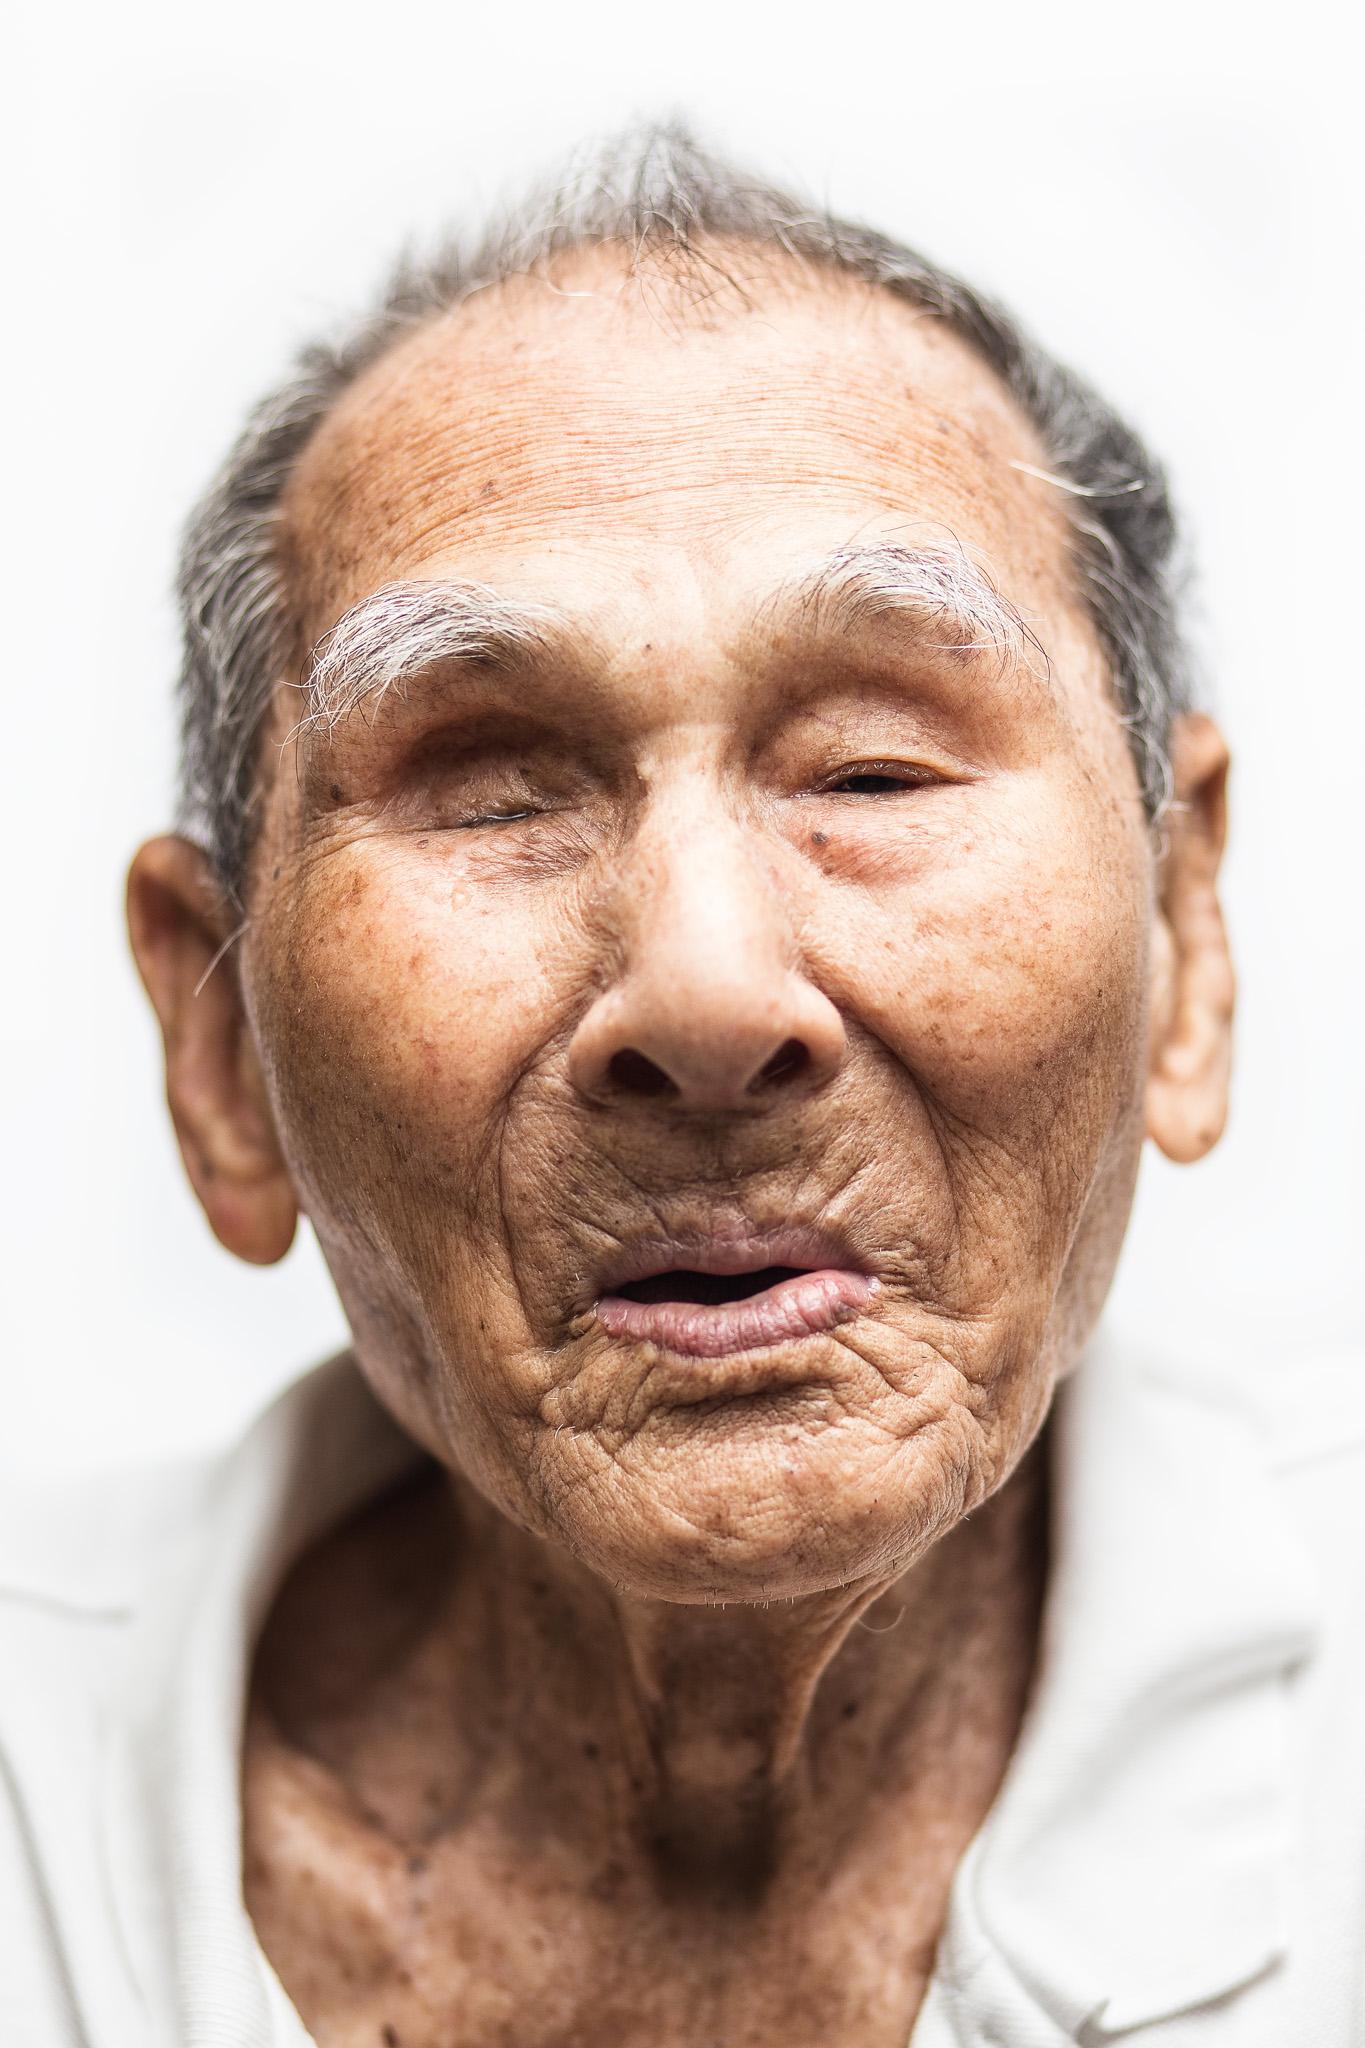 zainal-zainal-studio-centenarians-care-duke-nus-singapore-photographer-11.jpg